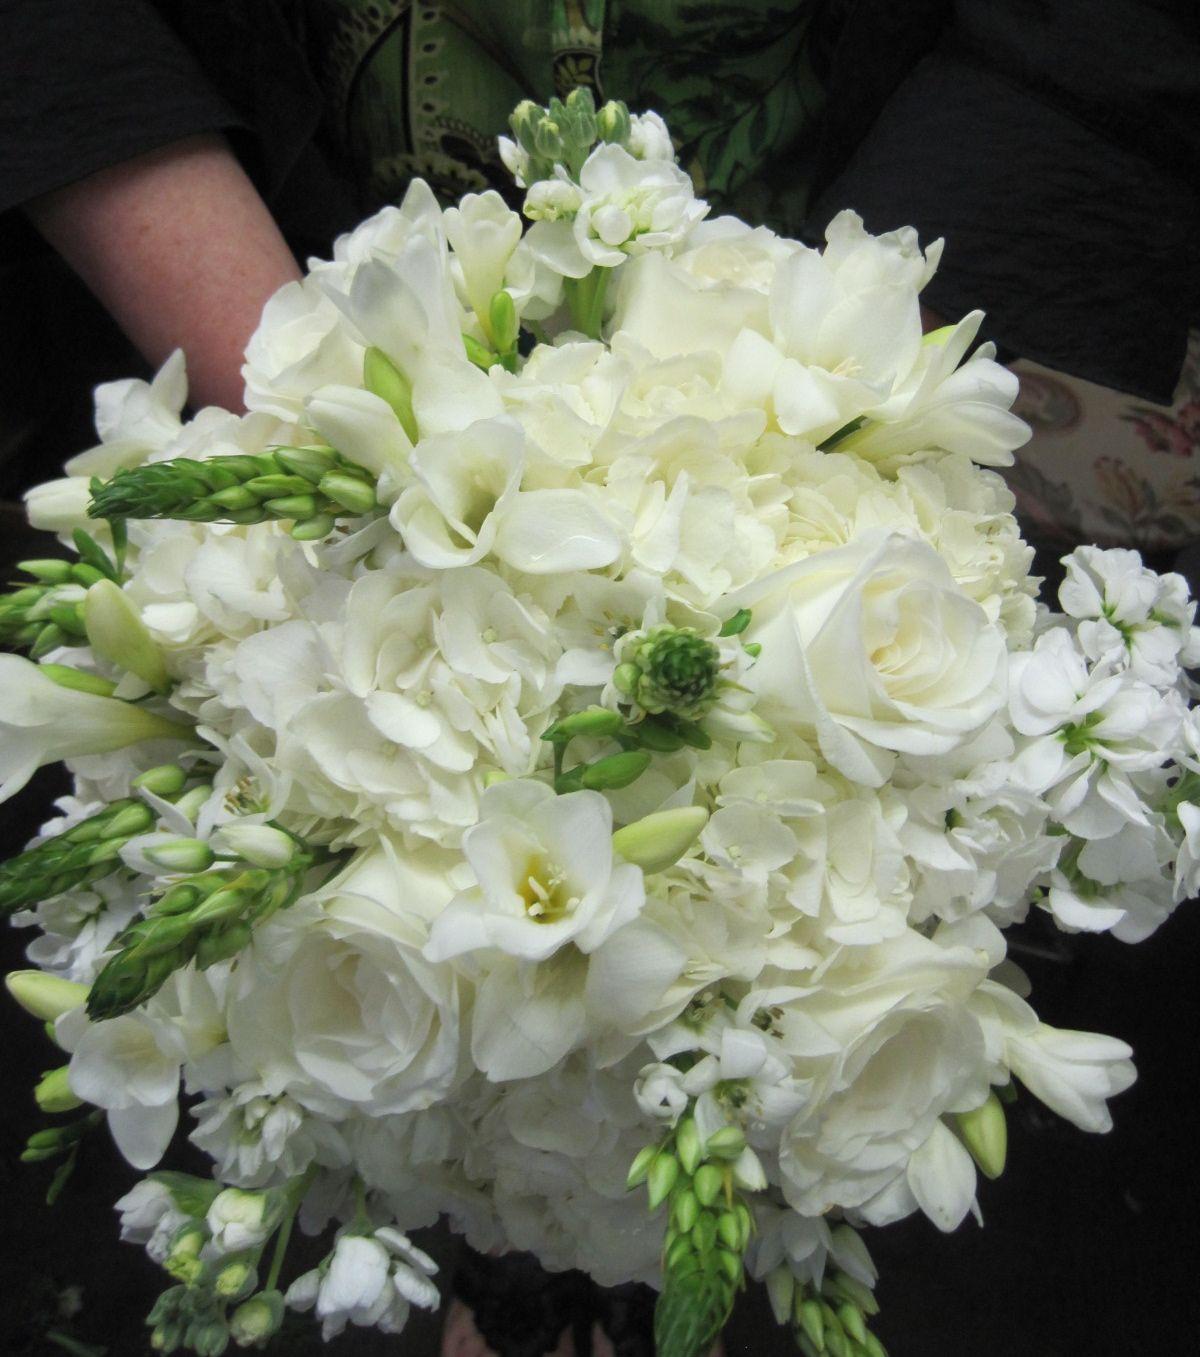 Wedding Flowers For November: Freesia, Hydrangea, Roses, And Star Of Bethlehem For A